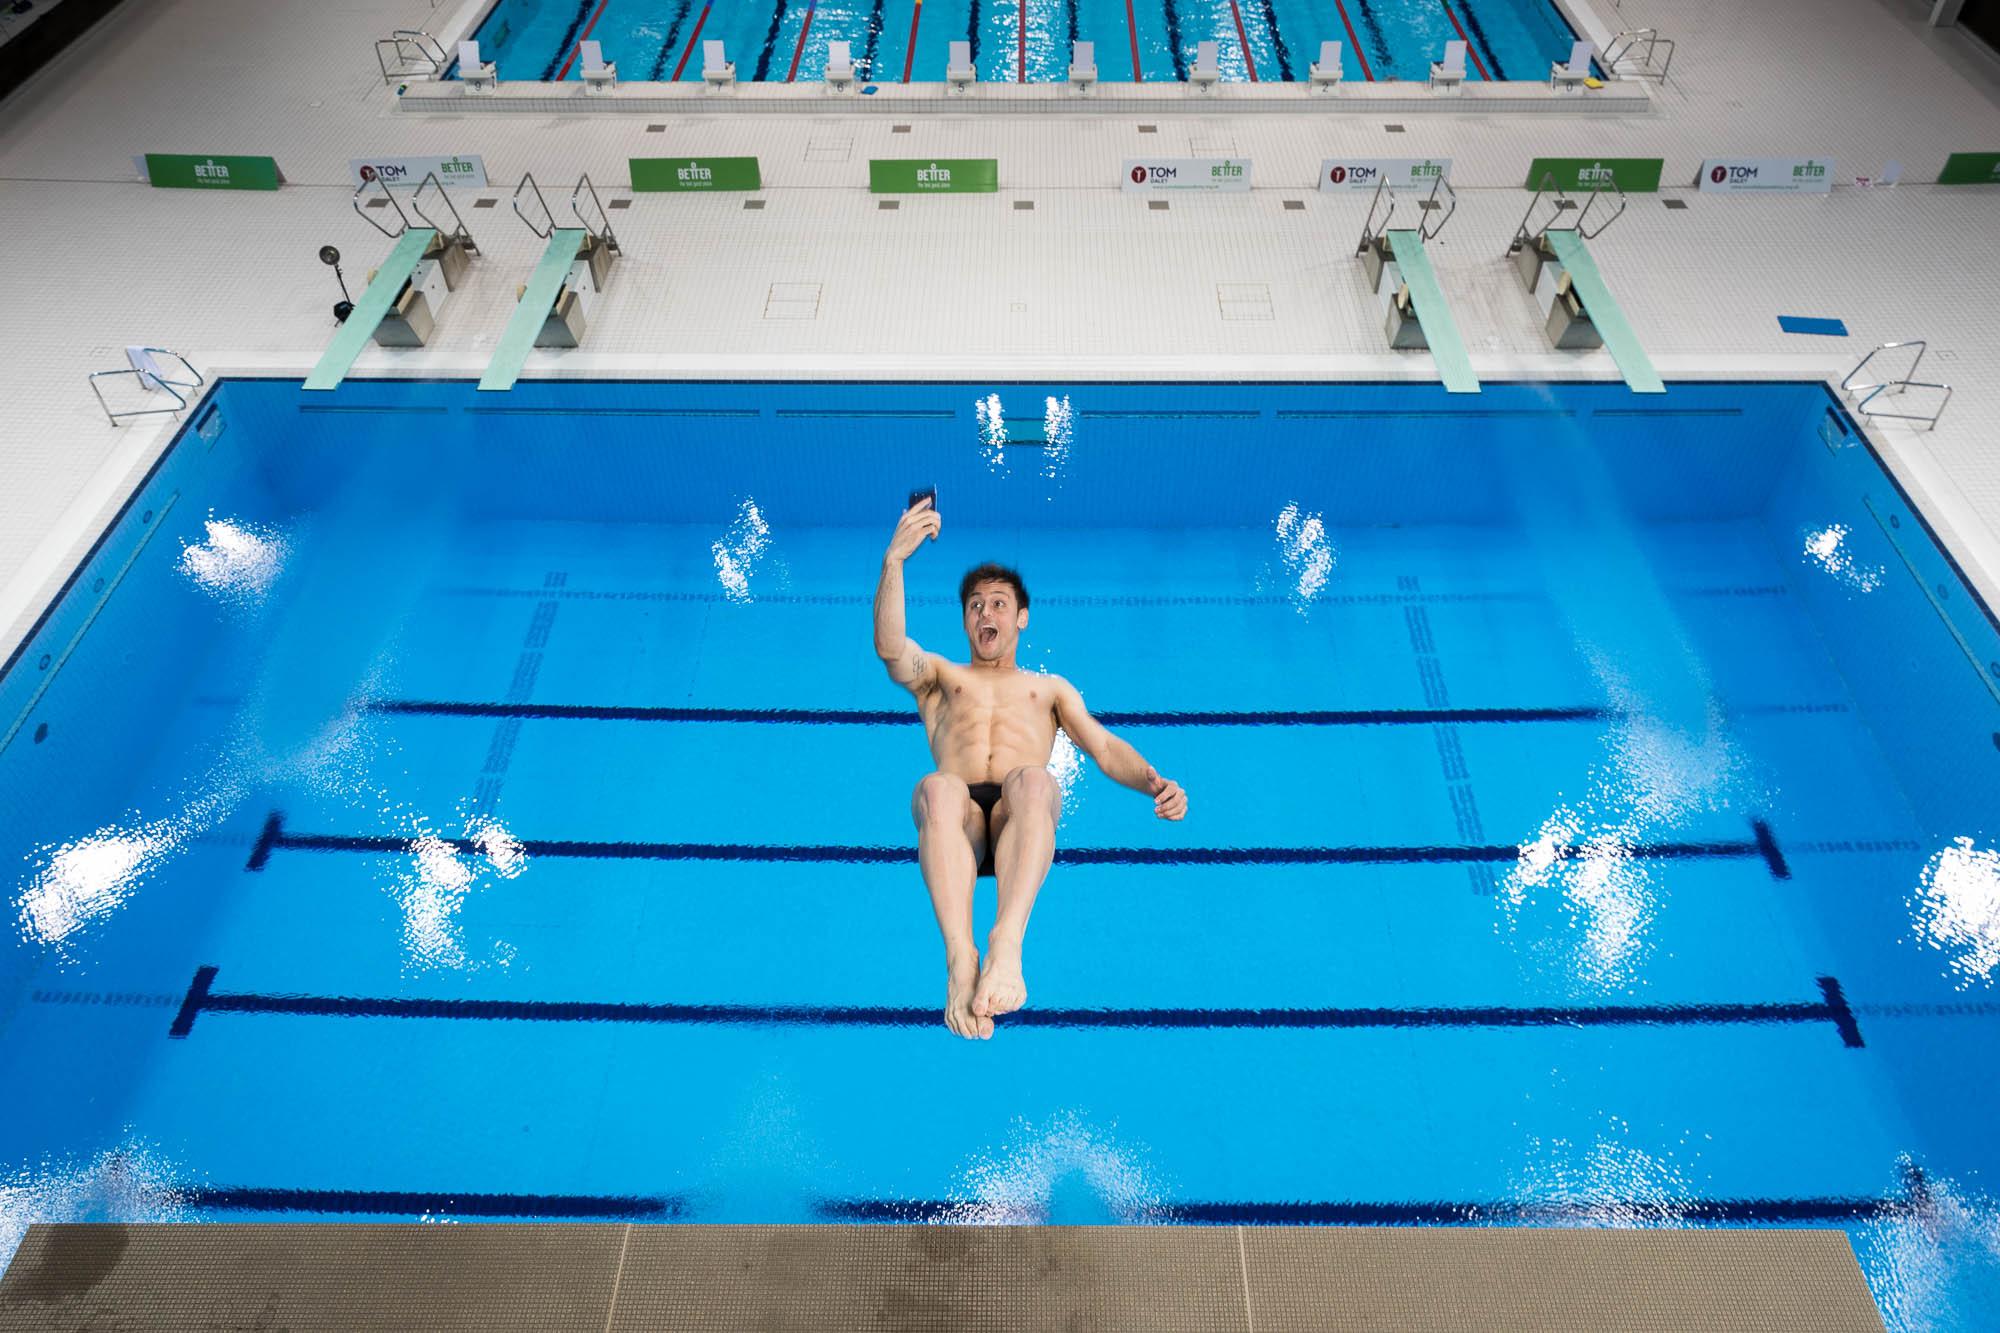 Tom Daley diving selfie